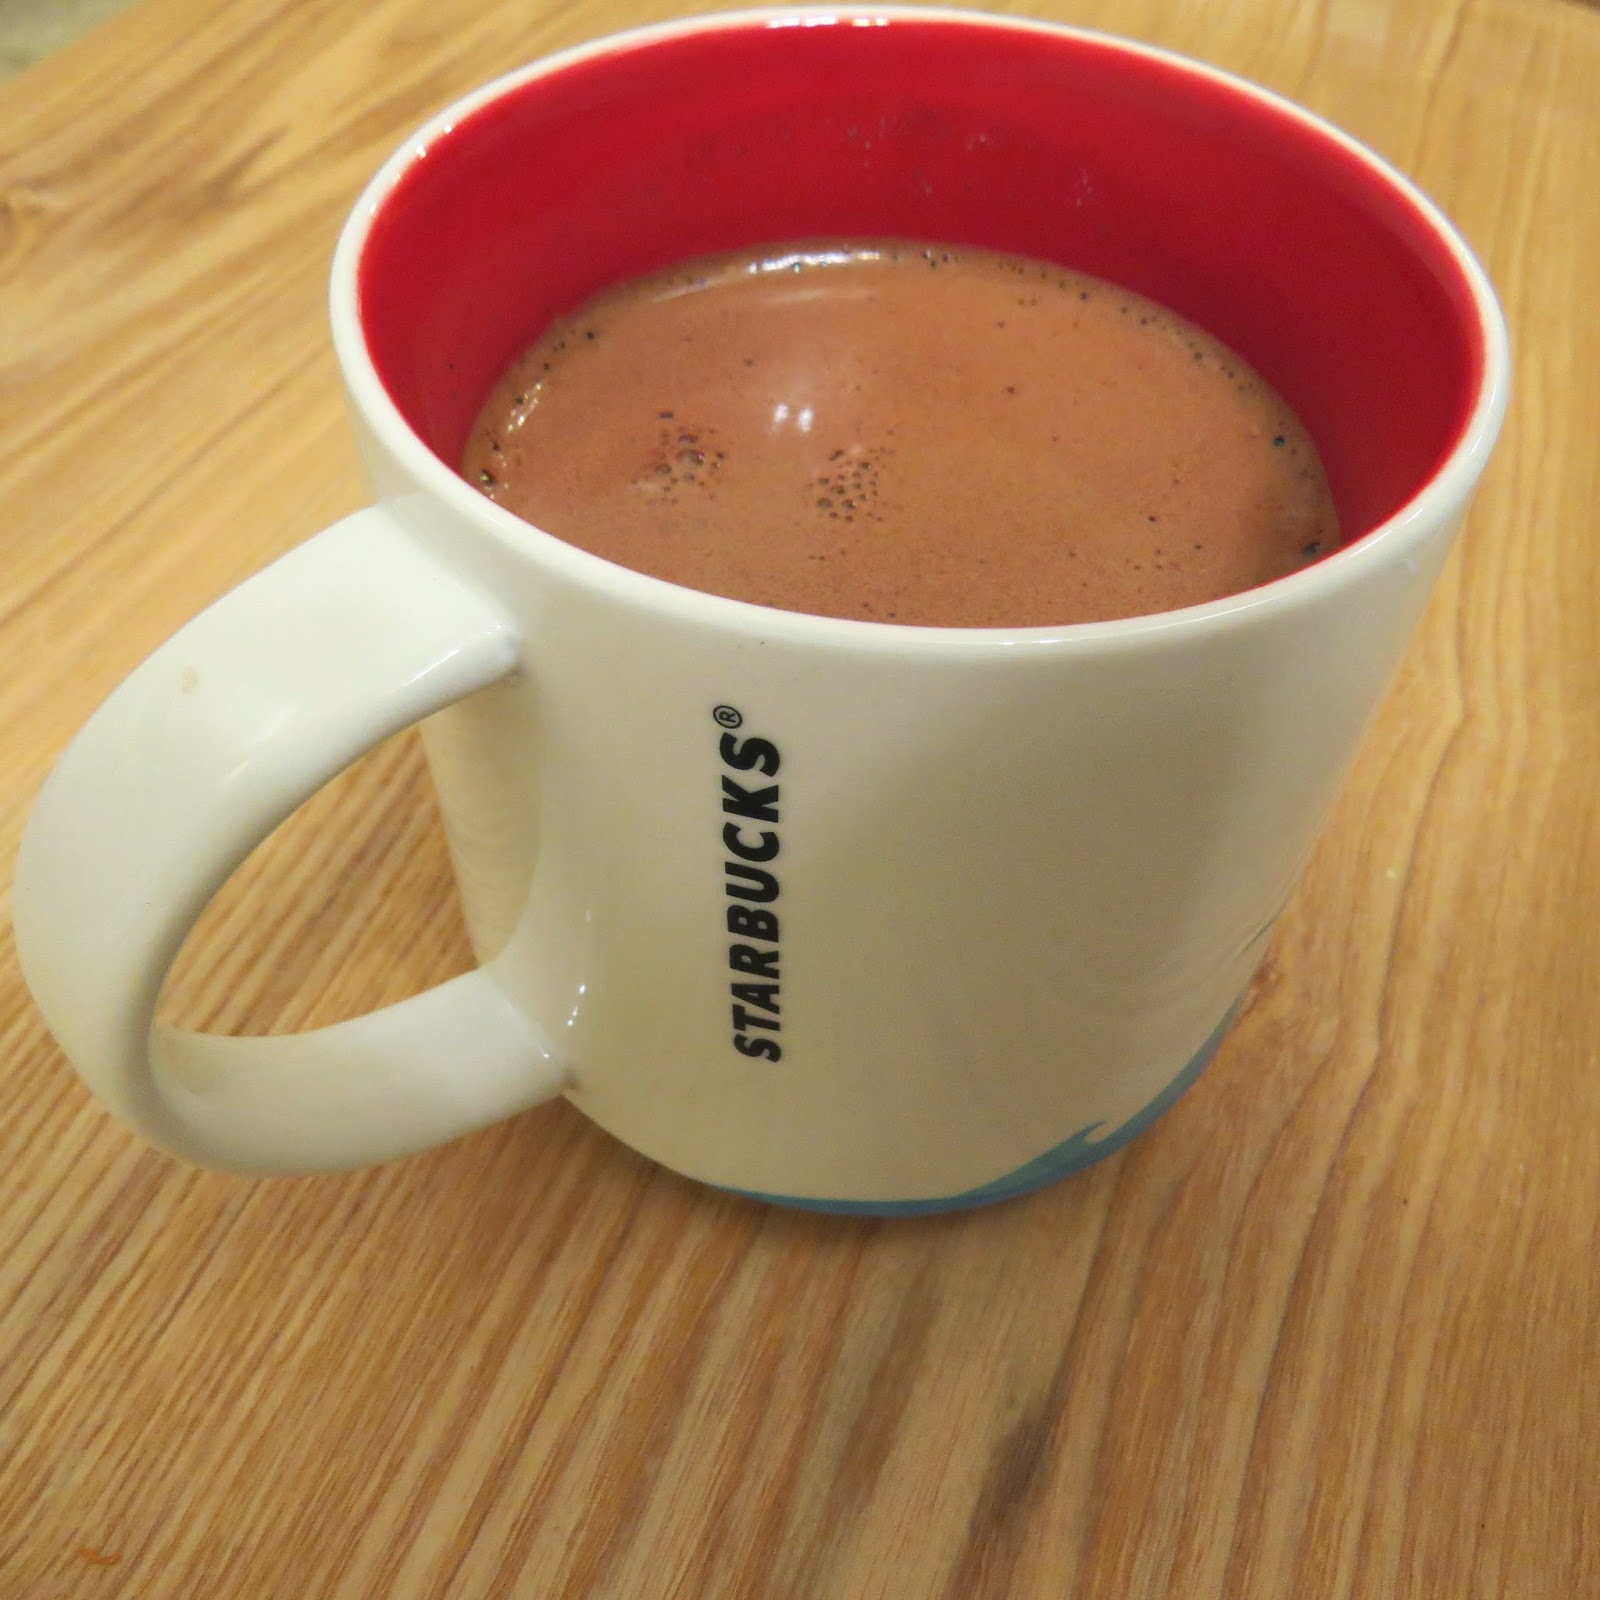 Starbucks VIA® Latte Caffè Mocha